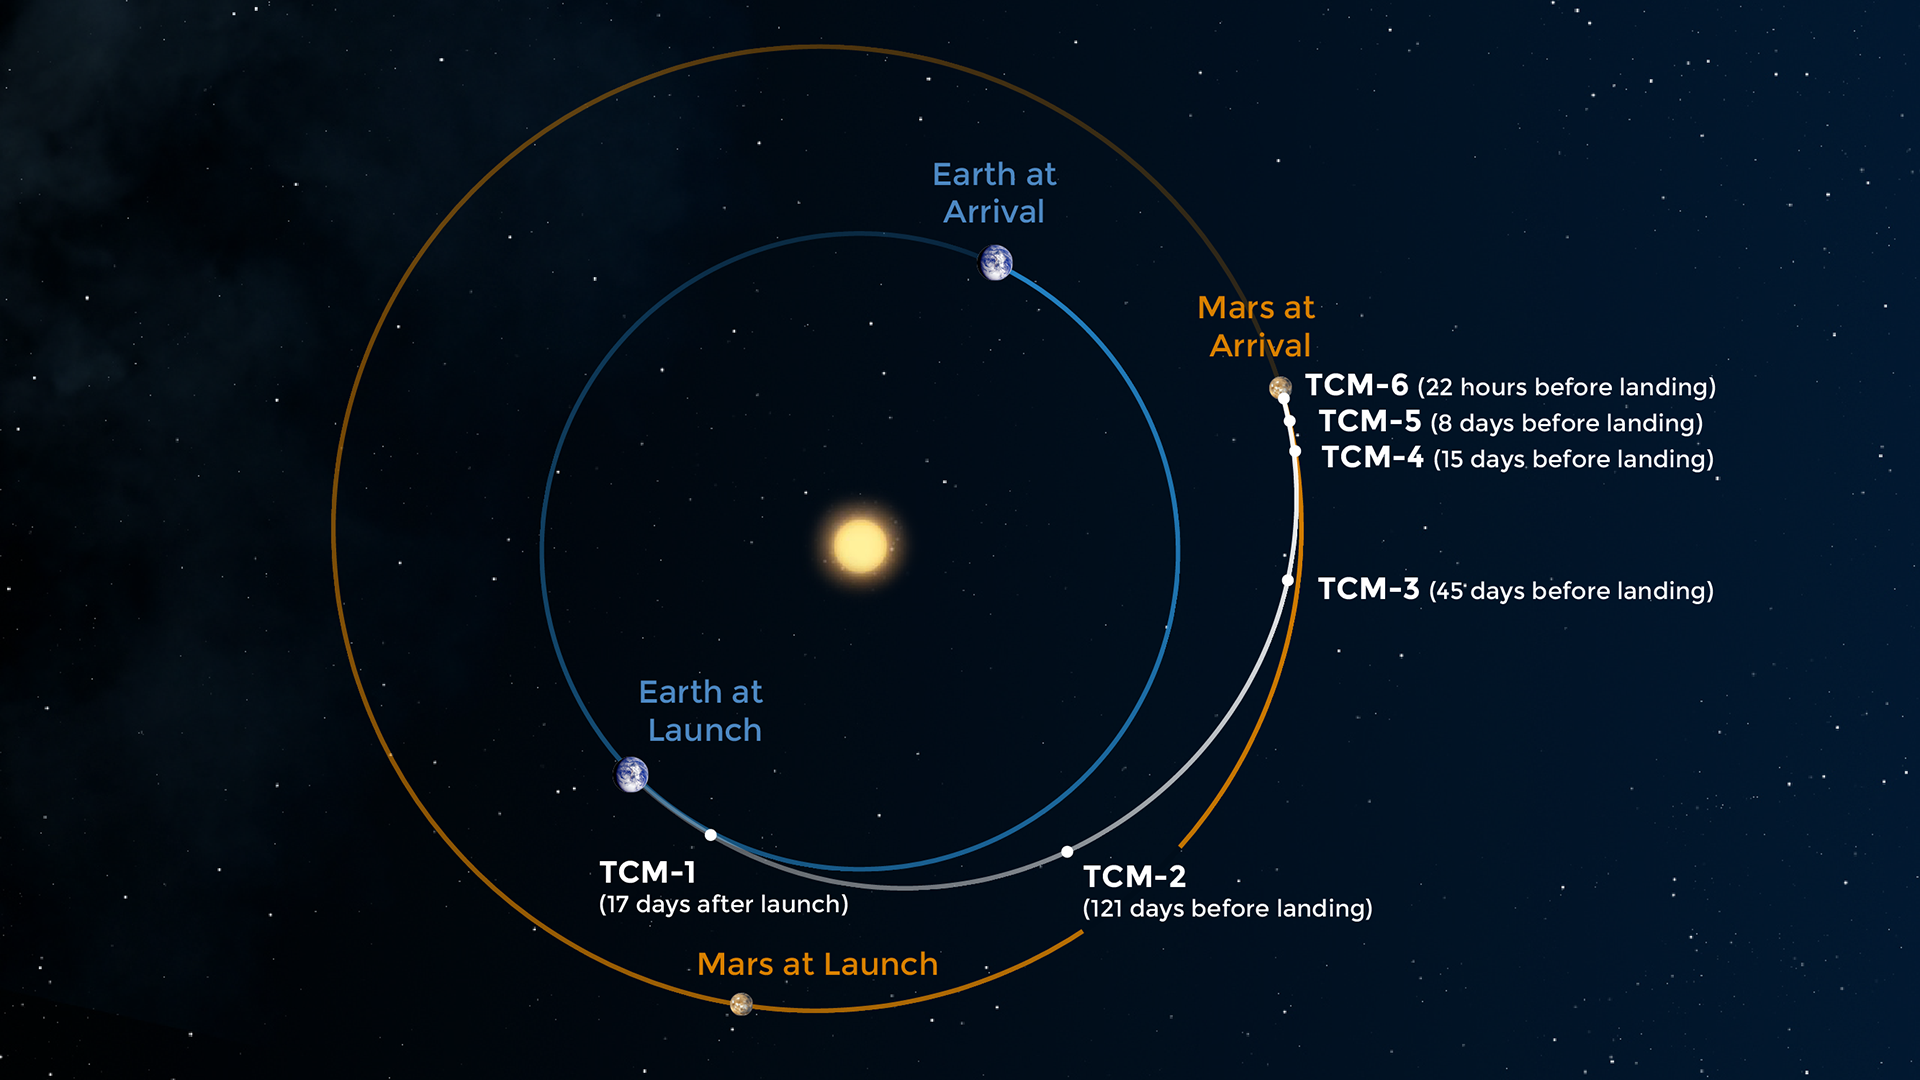 Insight S Route To Mars Nasa S Mars Exploration Program Images, Photos, Reviews